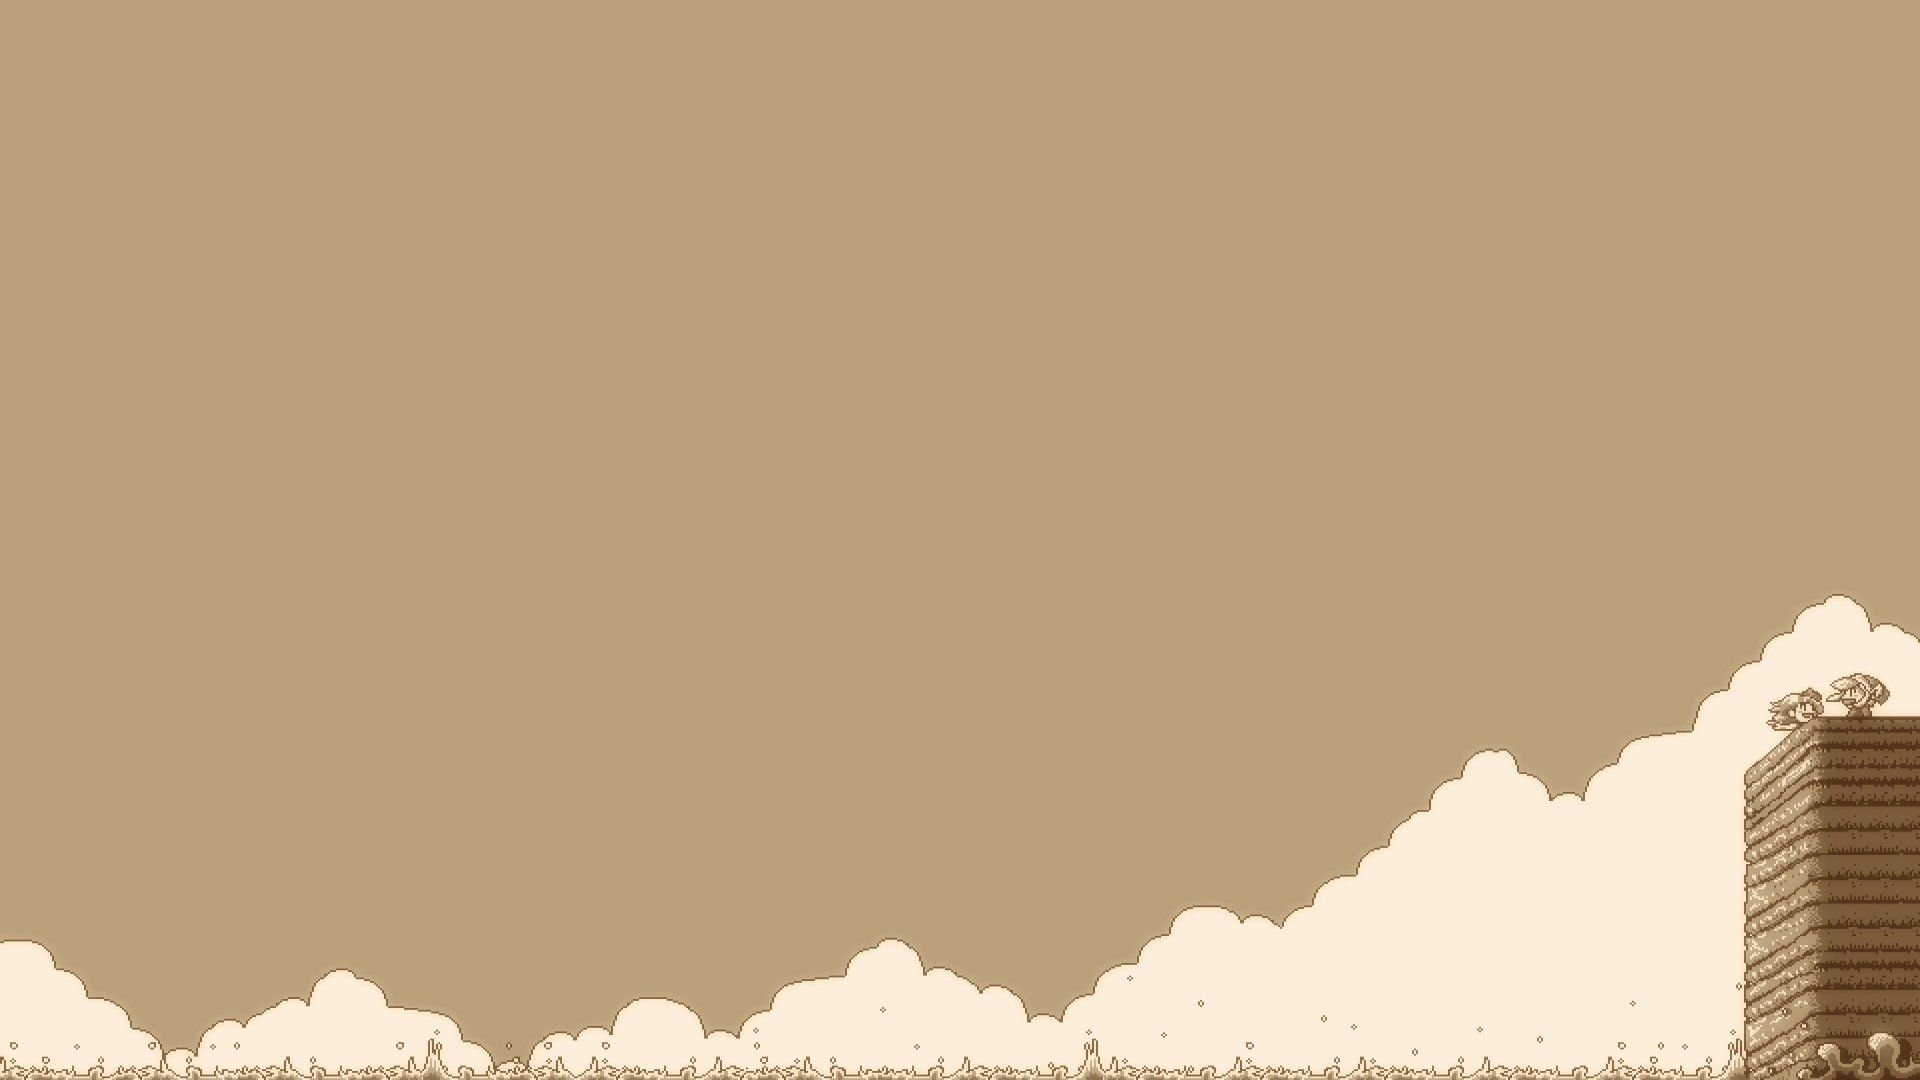 Beige Minimalist Wallpapers - Top Free Beige Minimalist ...